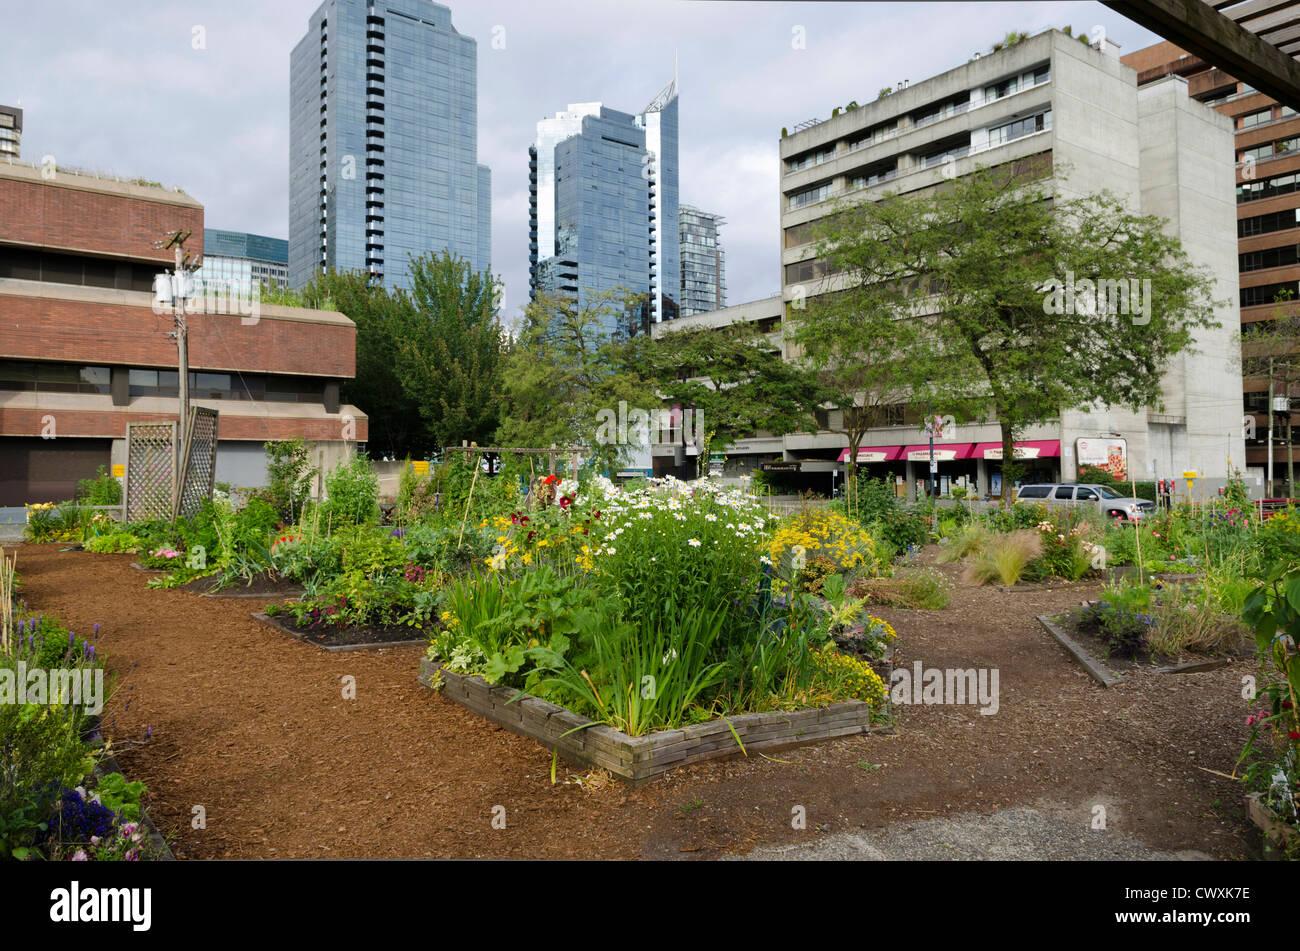 Urban Backyard Golden : Small Urban Garden With Golden Elm Bloodgood And Mixed Pots Part Of